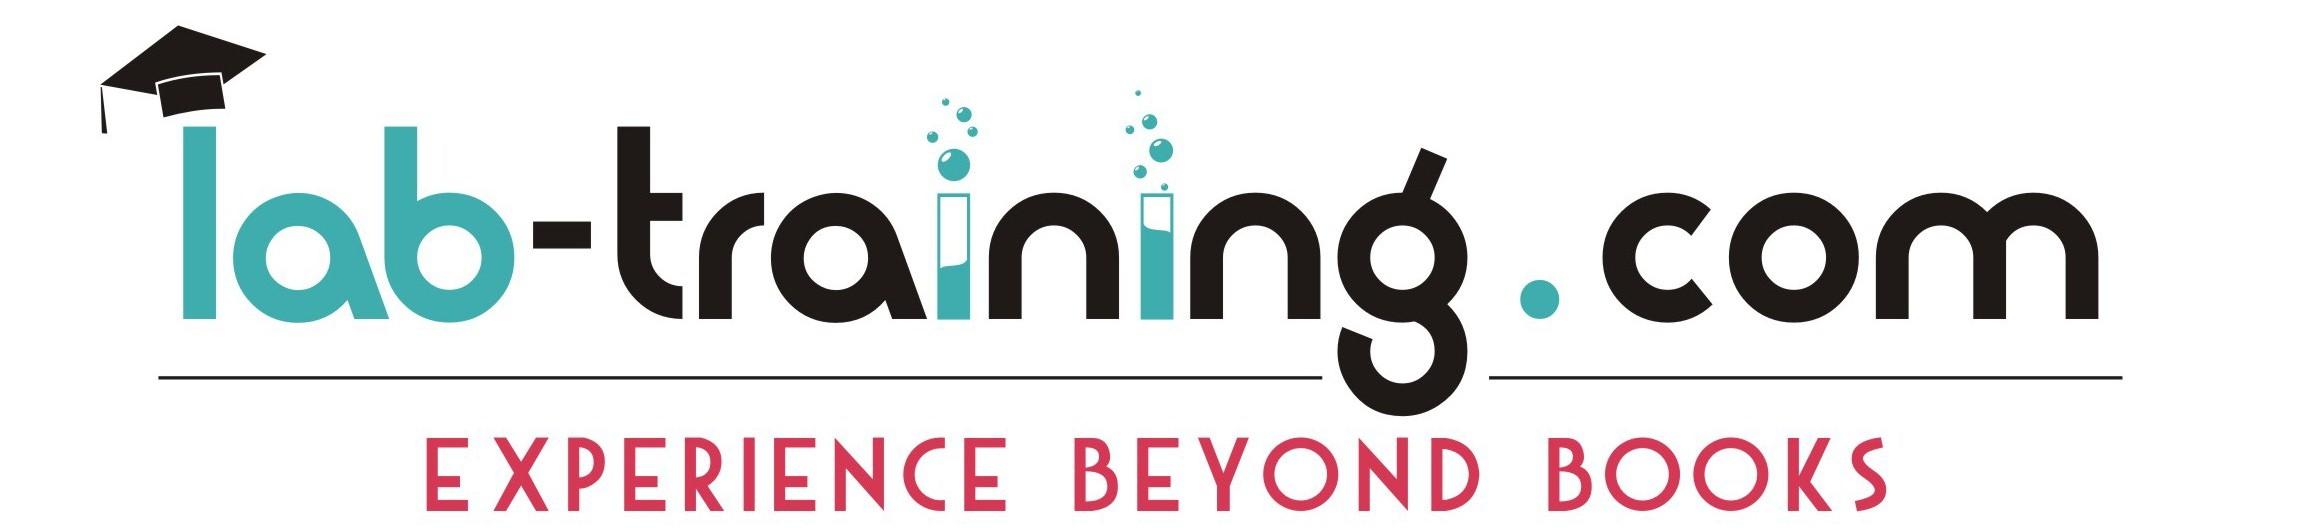 lab-training-logo-final